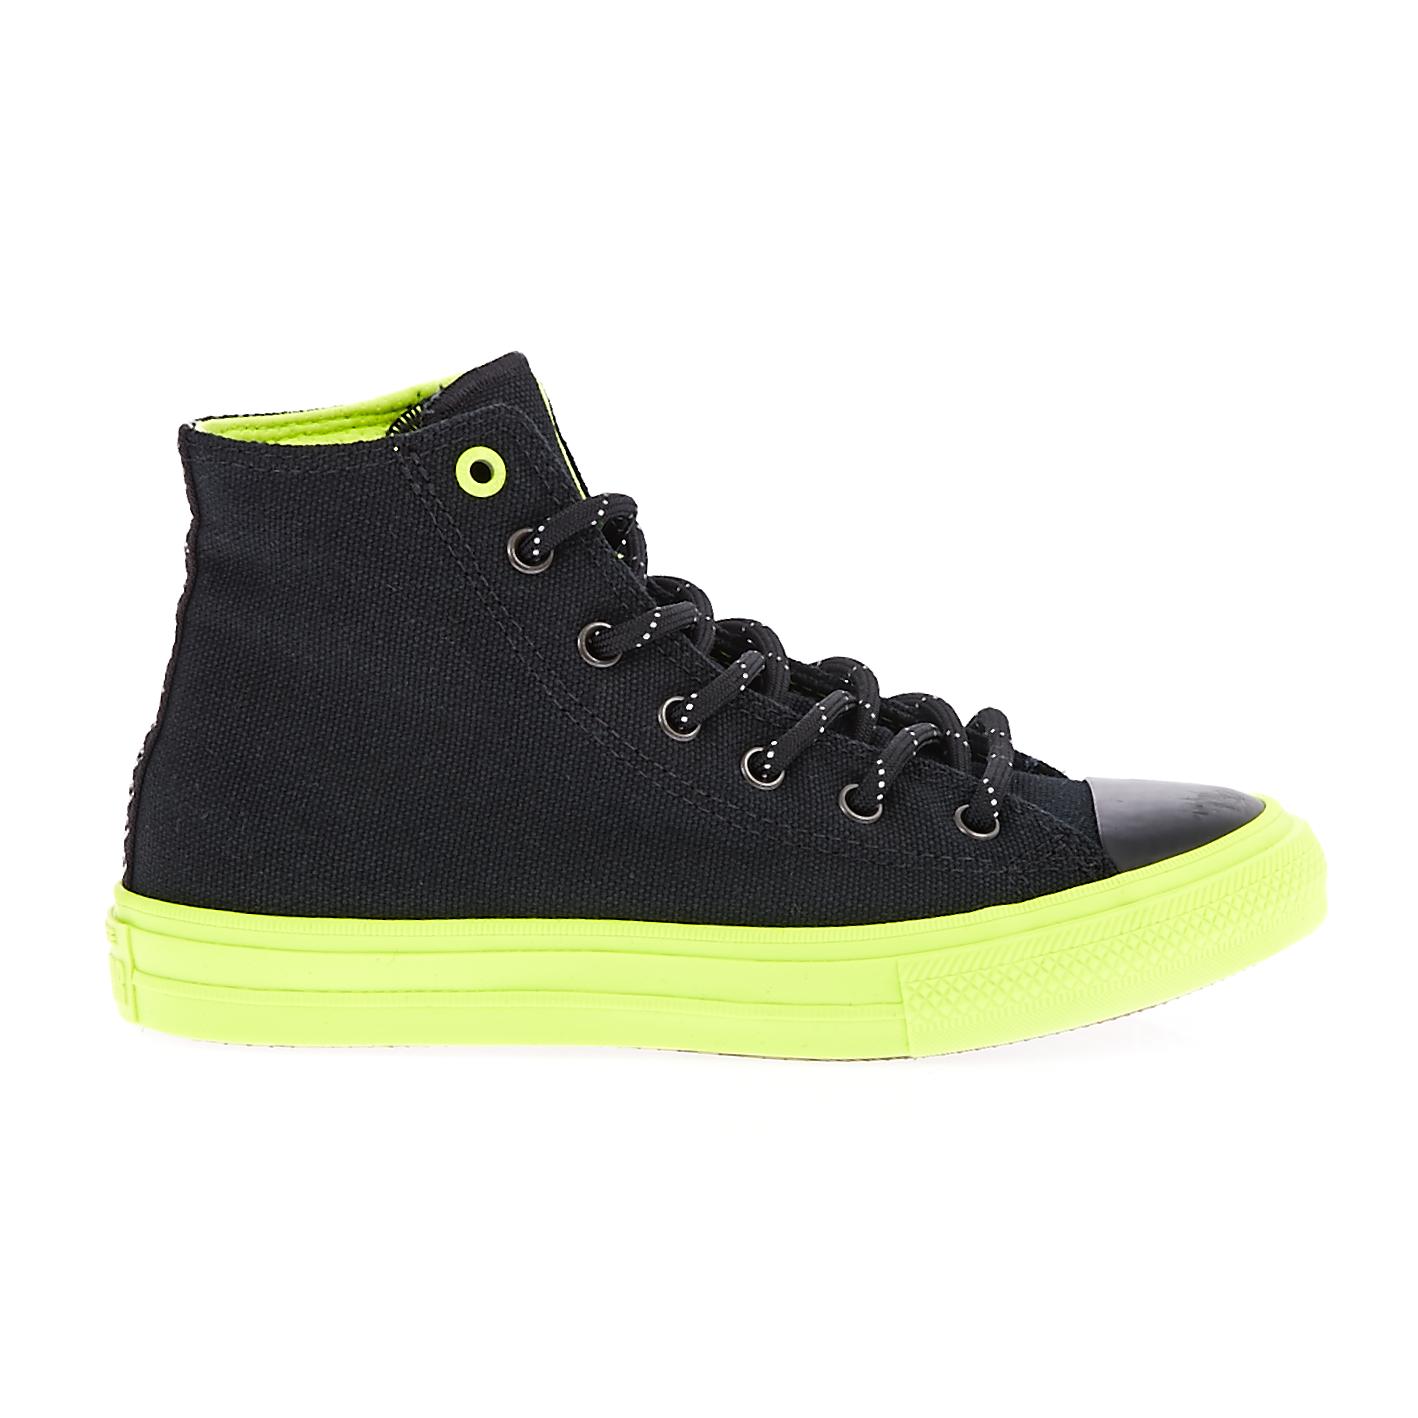 CONVERSE – Παιδικά παπούτσια Chuck Taylor All Star ll Hi μαύρα